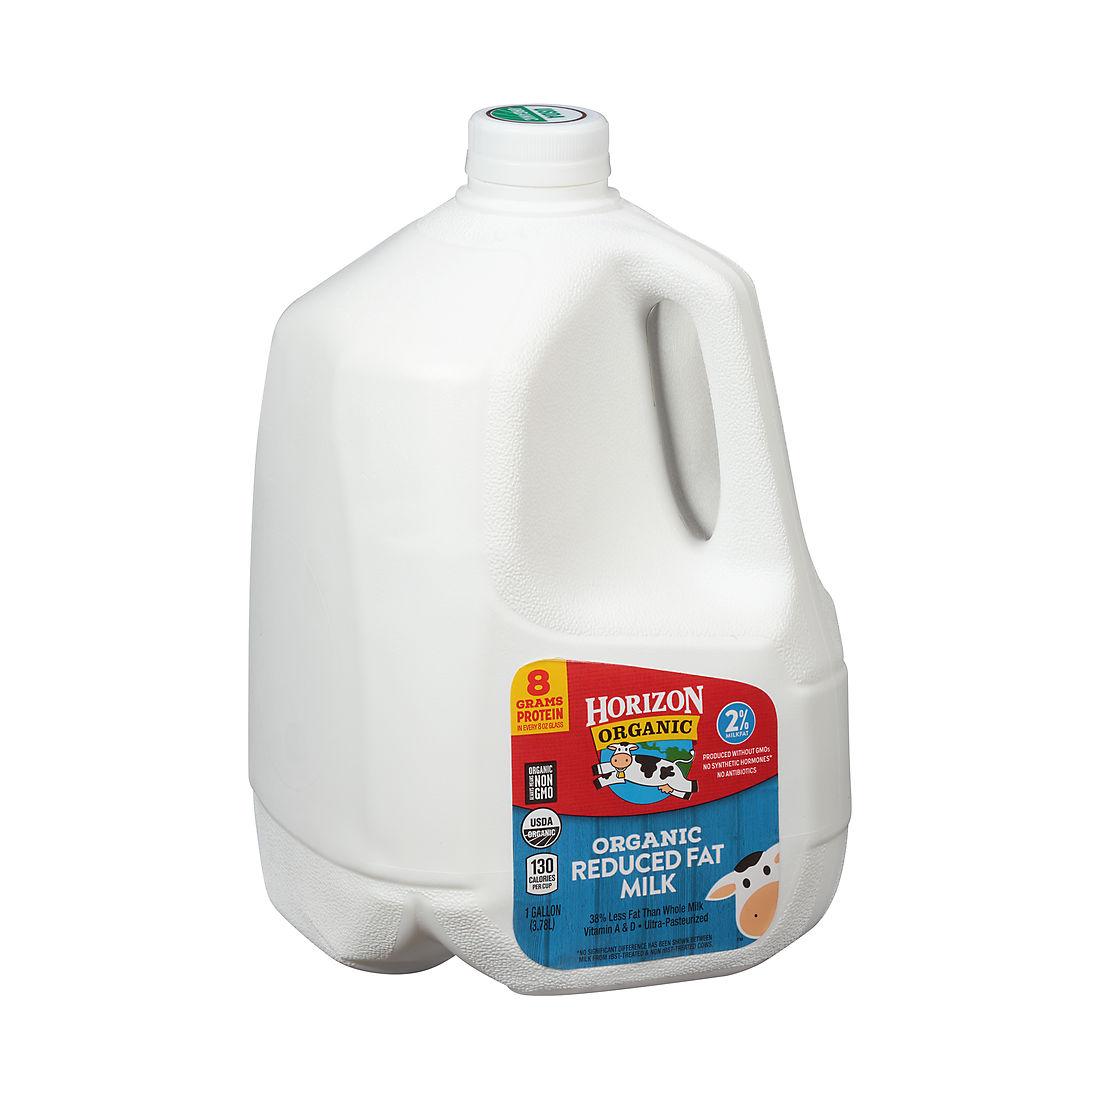 Horizon Organic 2 Milk 128 Oz Bjs Wholesale Club